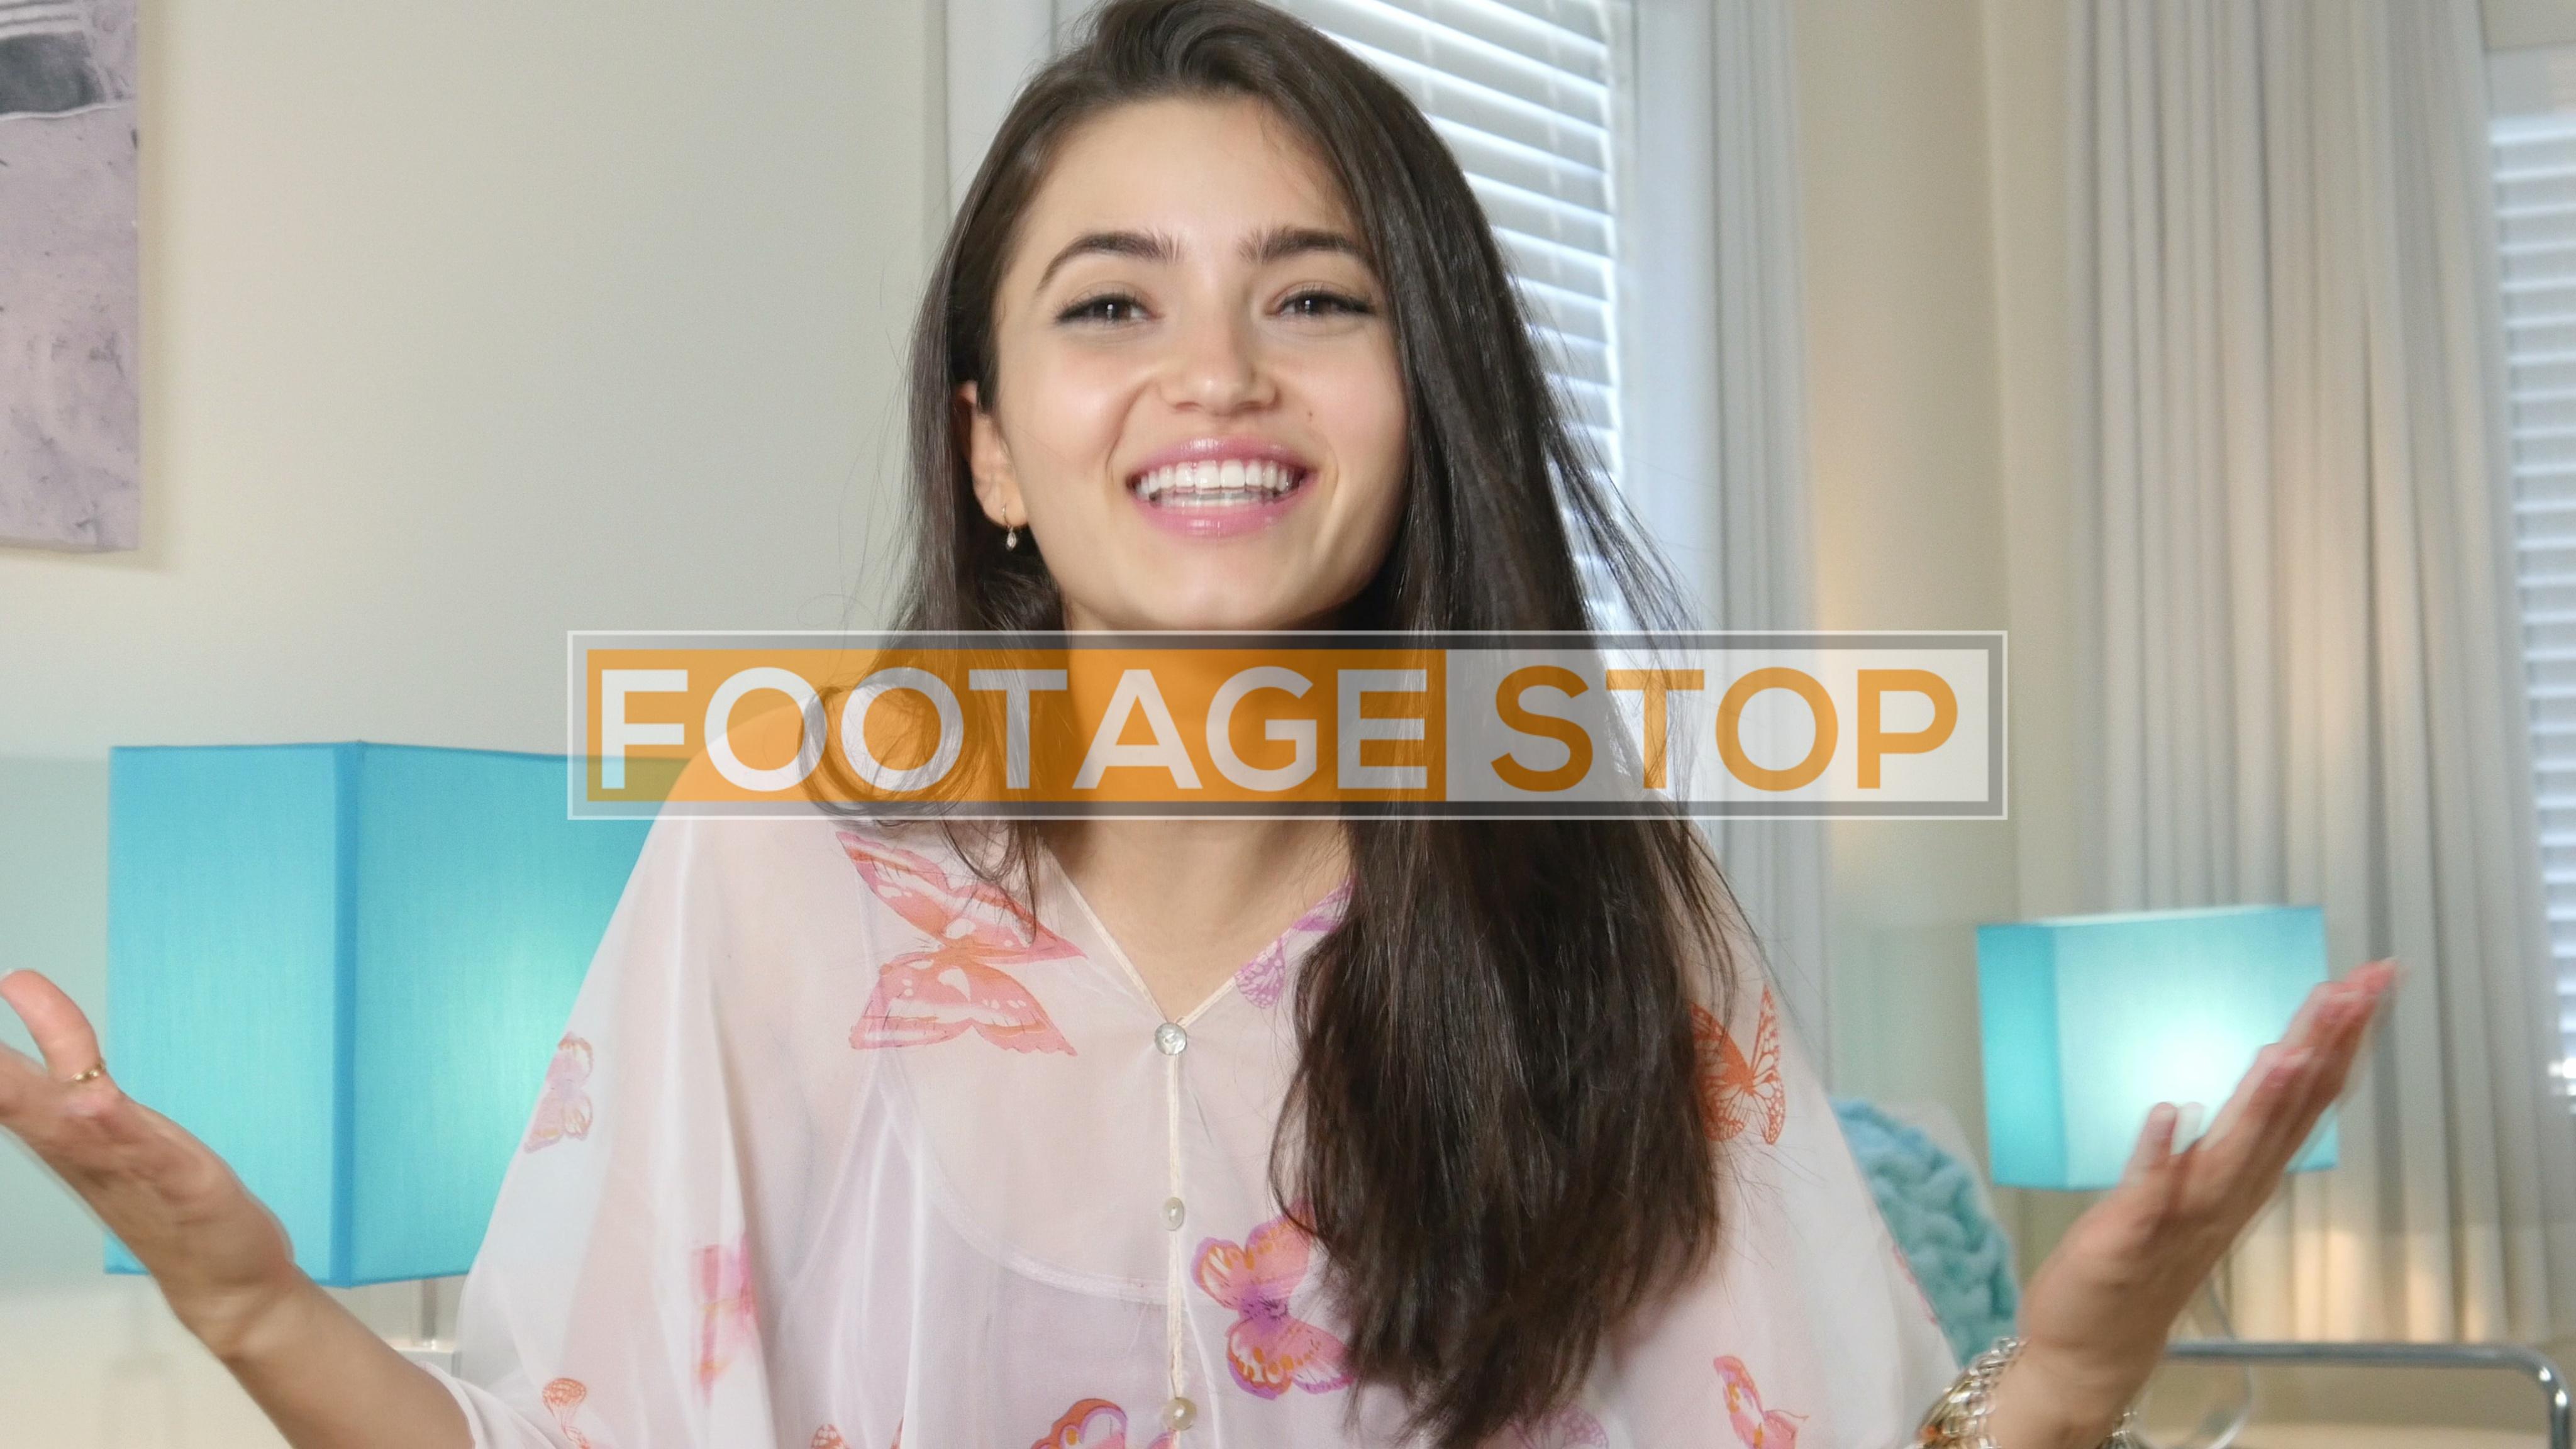 millennial-girl-stock-video-footage